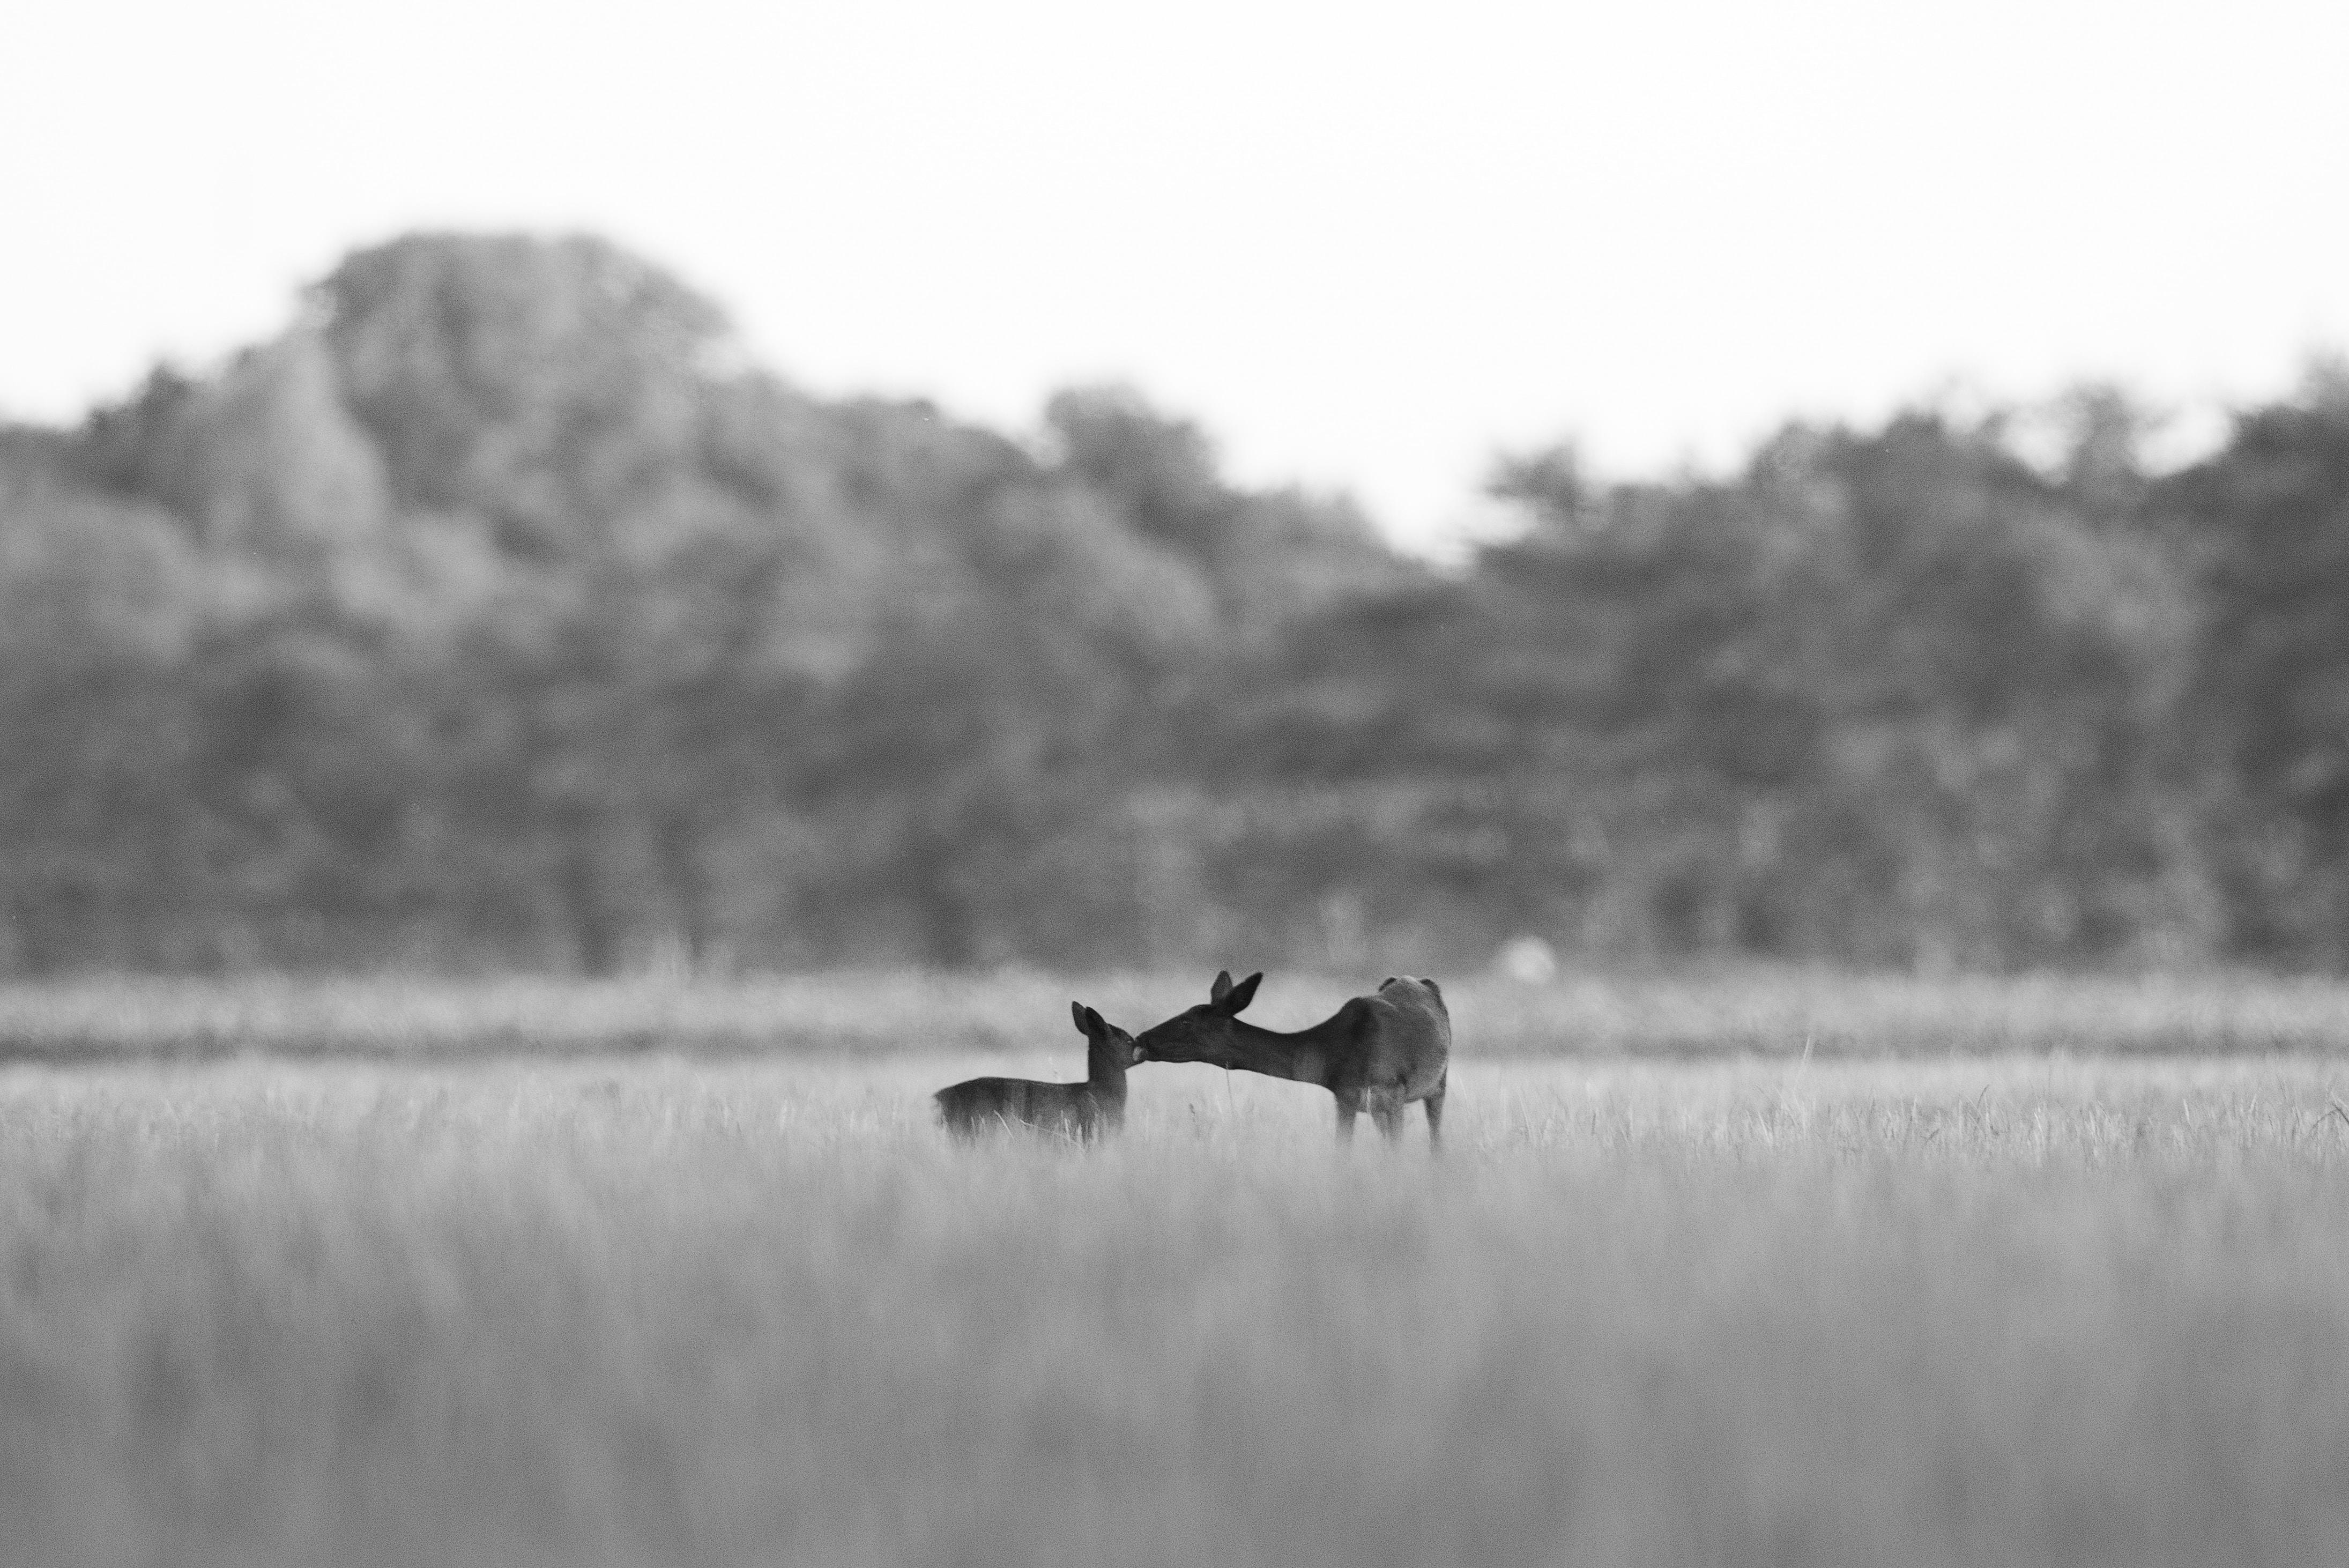 grayscale photo of deers on field